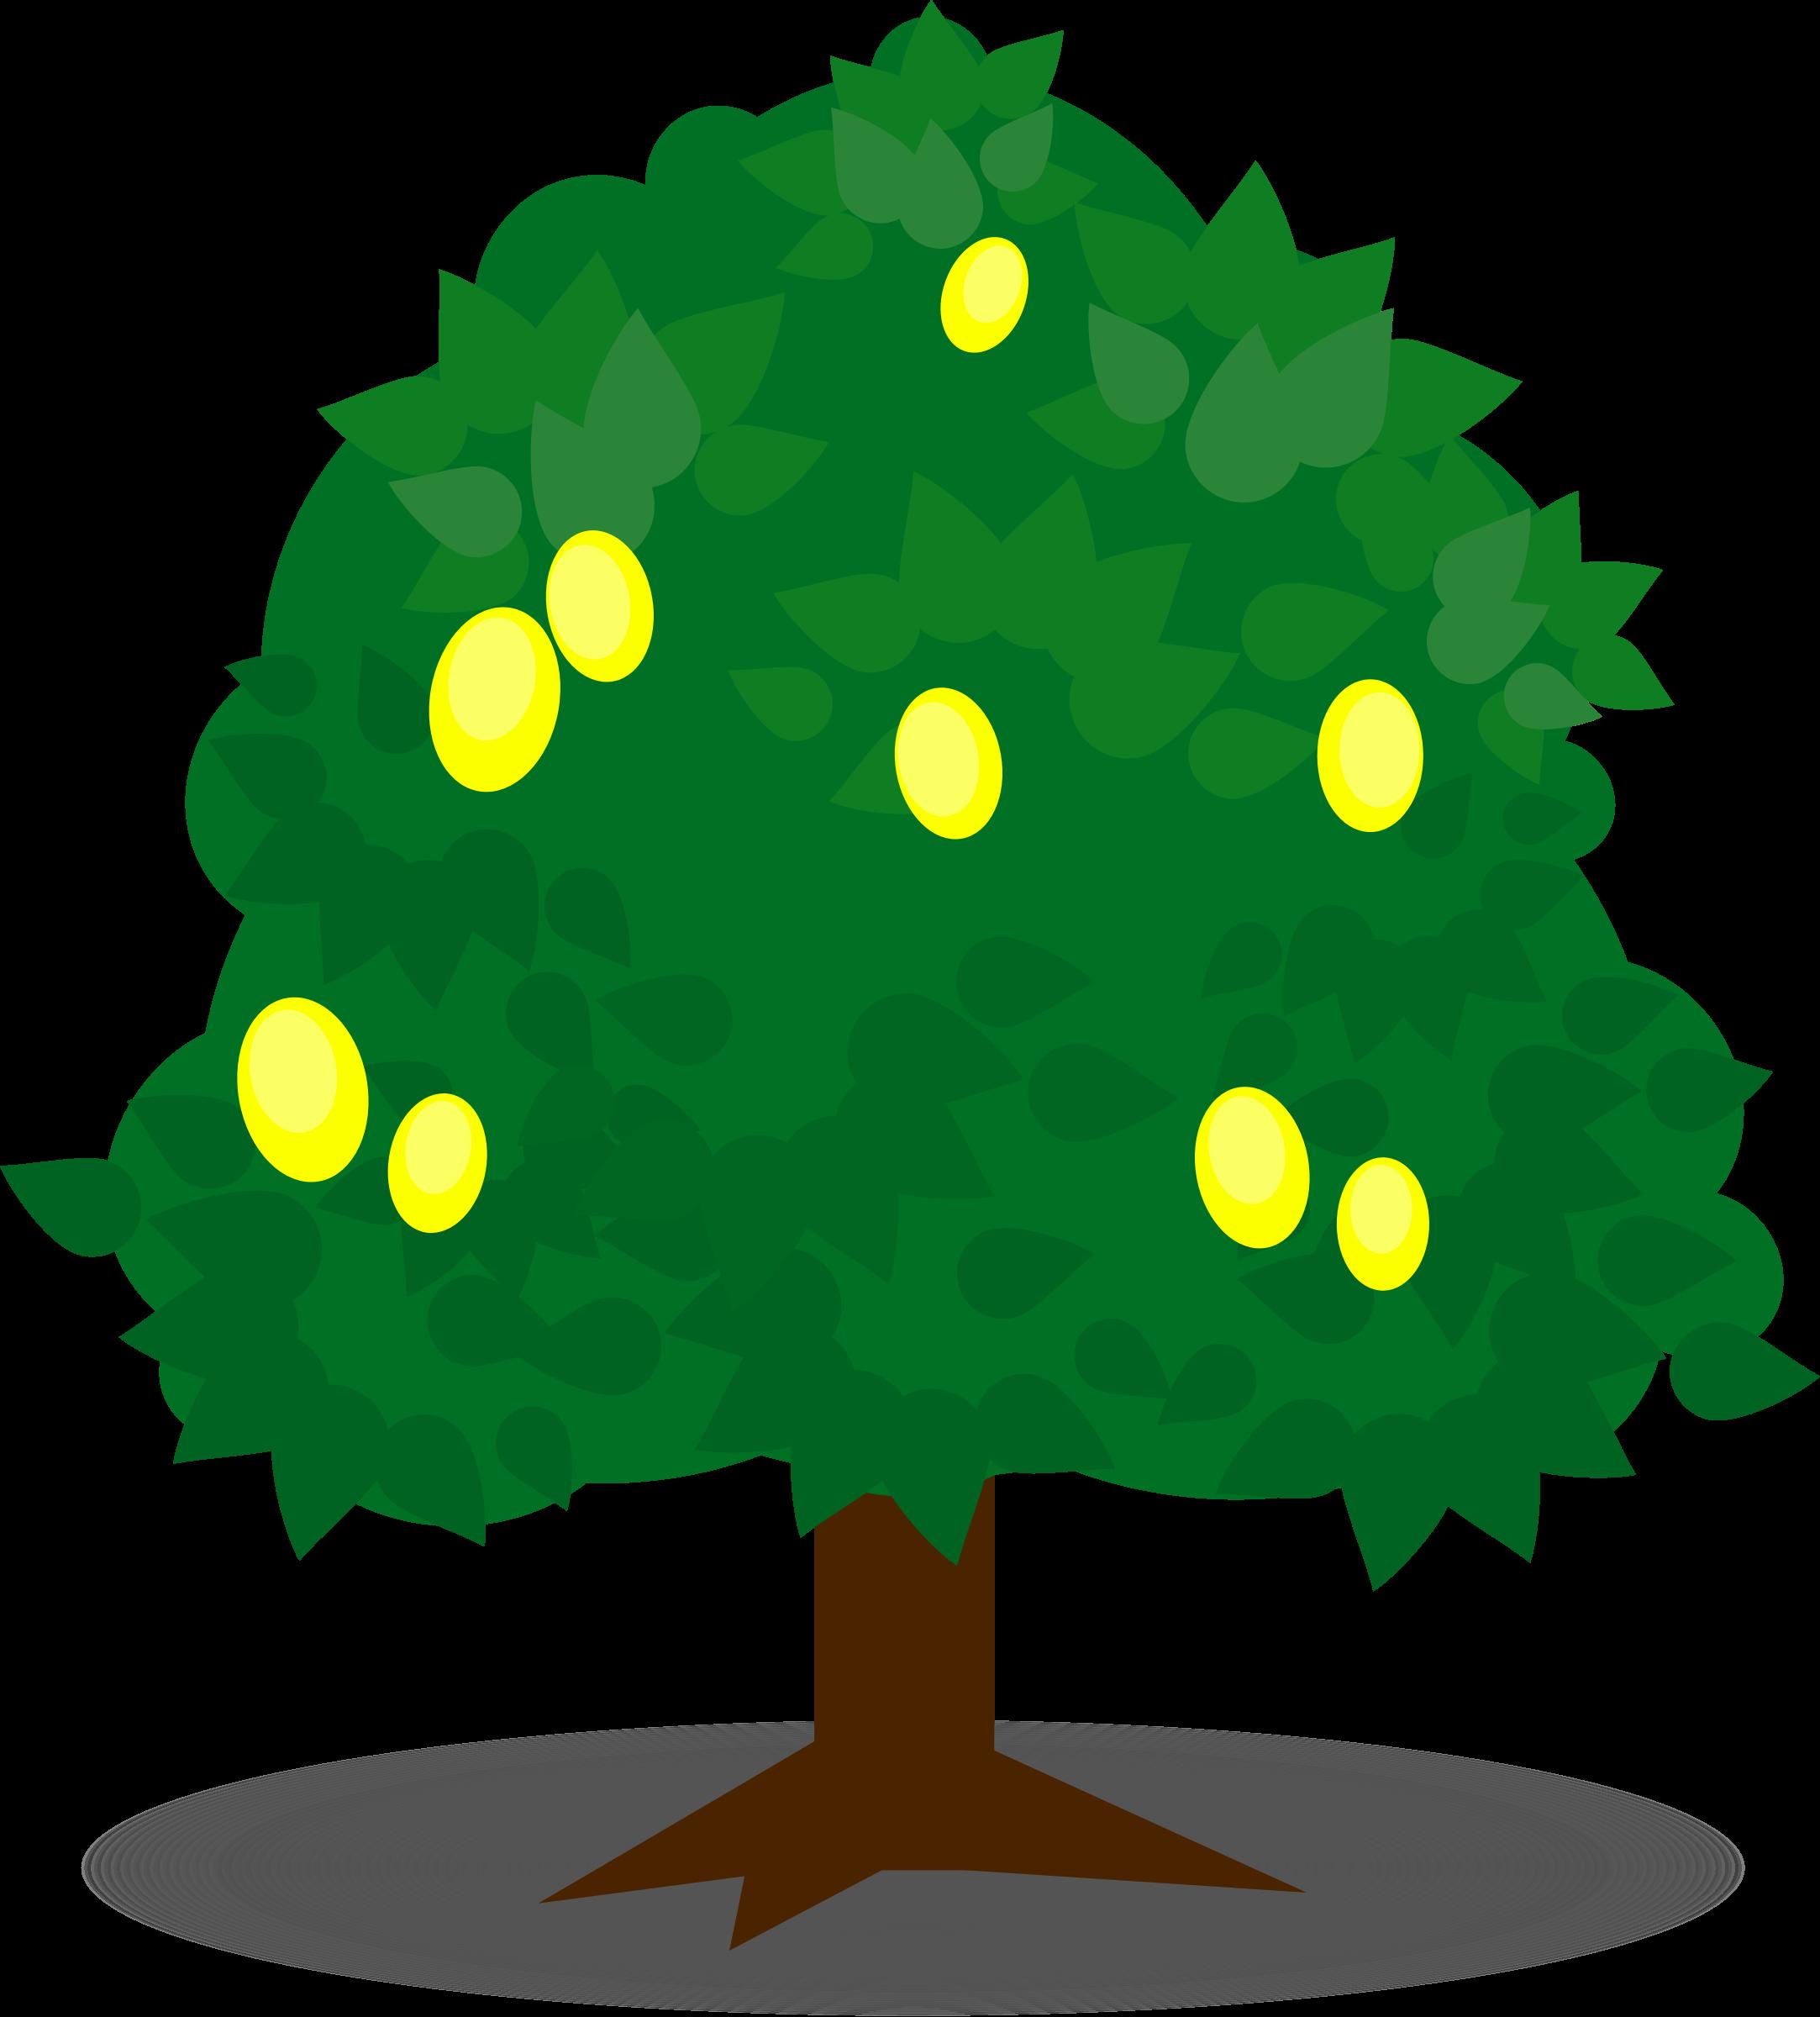 Transparent tree clipart - Lemon Tree Clipart - Fruit Tree Clipart Png